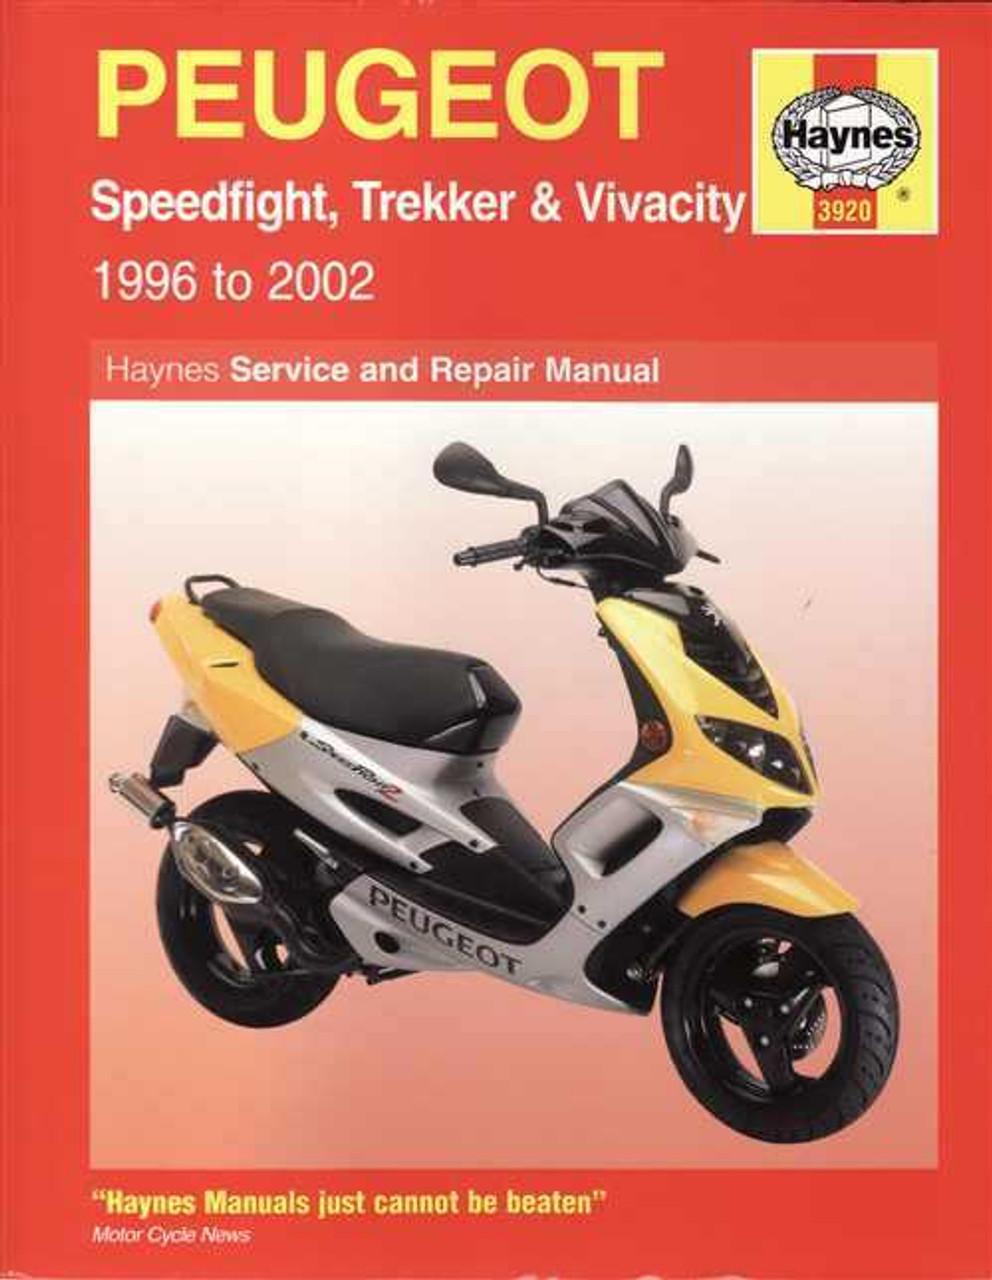 small resolution of peugeot scooters speedfight trekker amp vivacity 1996 2002 workshop manual